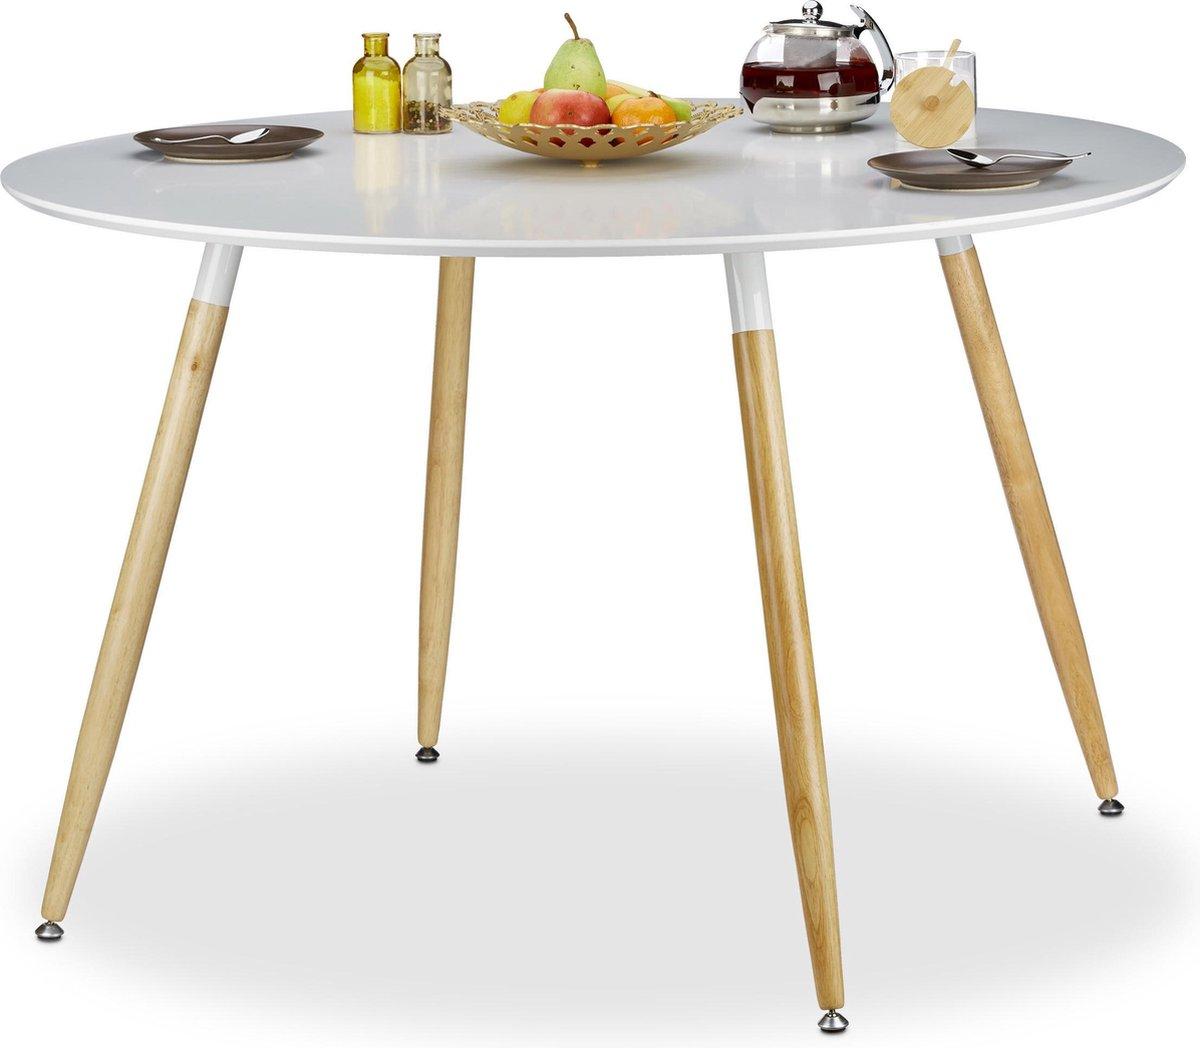 relaxdays - eettafel rond - eetkamertafel - eetkamer tafel 6 - 8 pers. - hout wit - Relaxdays